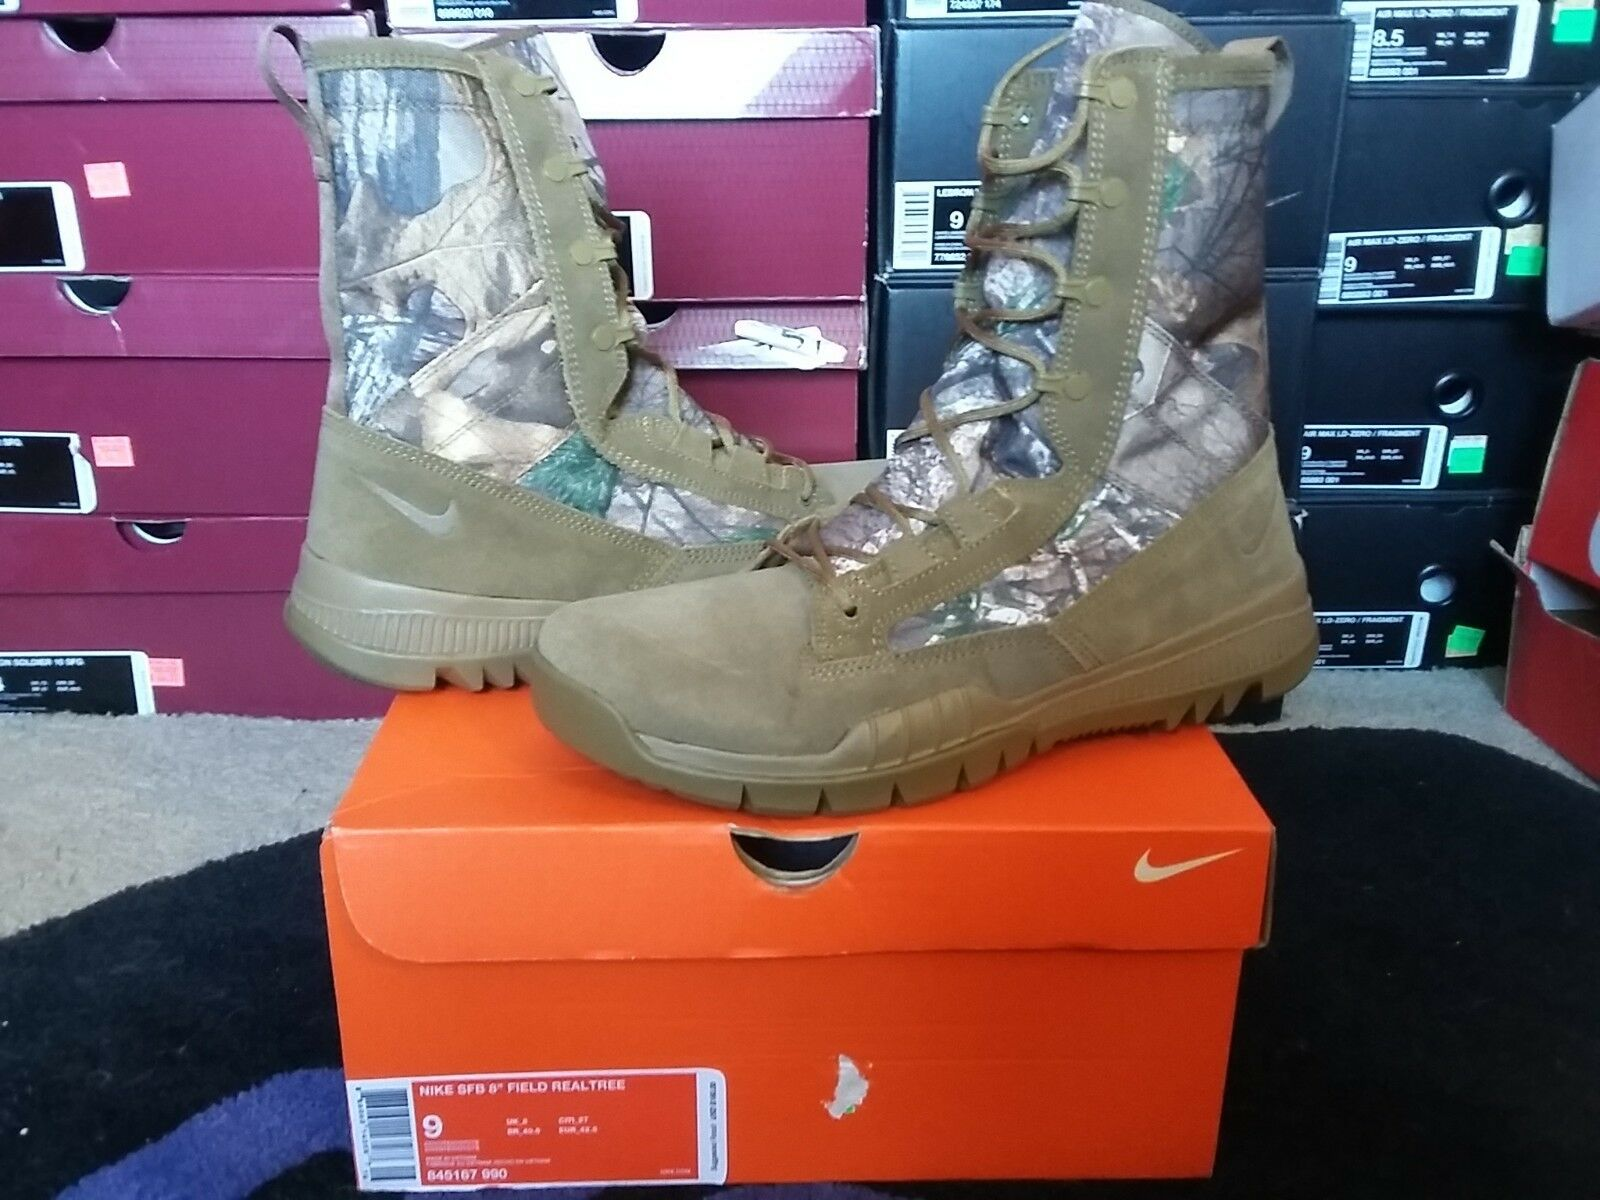 Nike Air SFB 8 campo Realtree Camo ACG Coyote caza militar 845167 990 salvaje caza Coyote botas zapatos casuales 335864